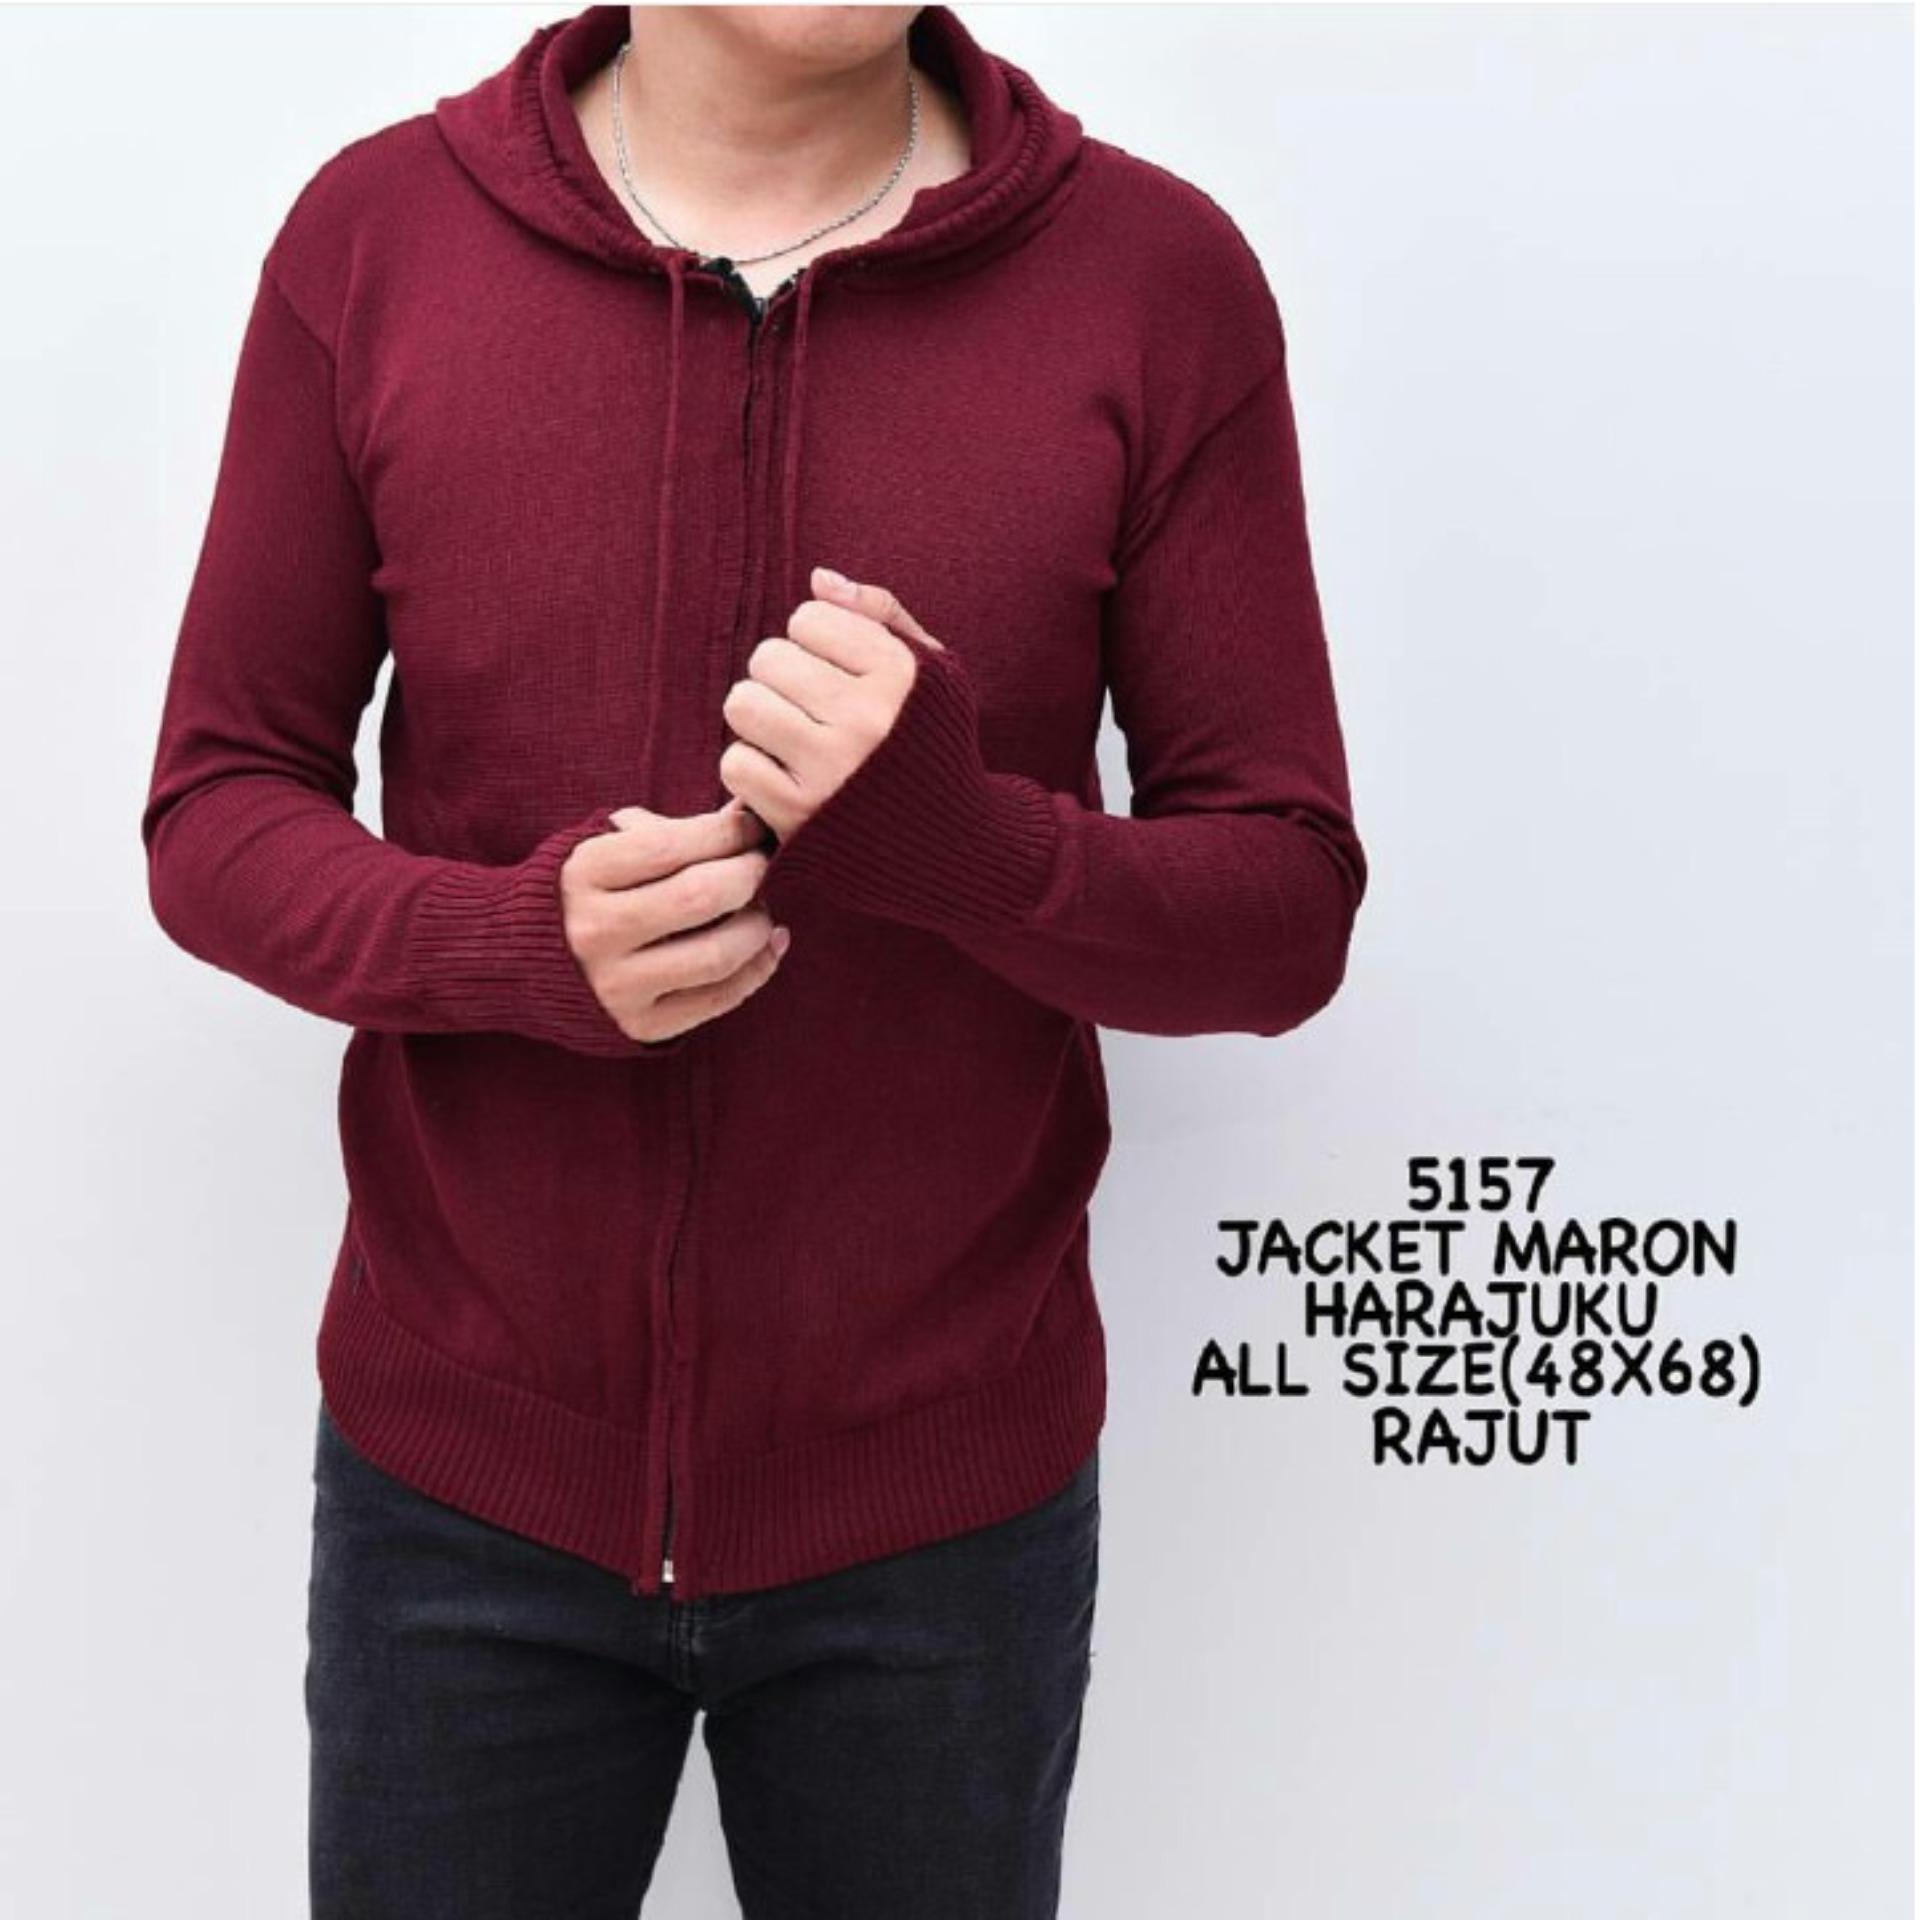 bajuku murah 5157 maroon harajuku sweater pria kaos pria tangan panjang  pake kupluk pake hoodie fashion a7a7242ec3